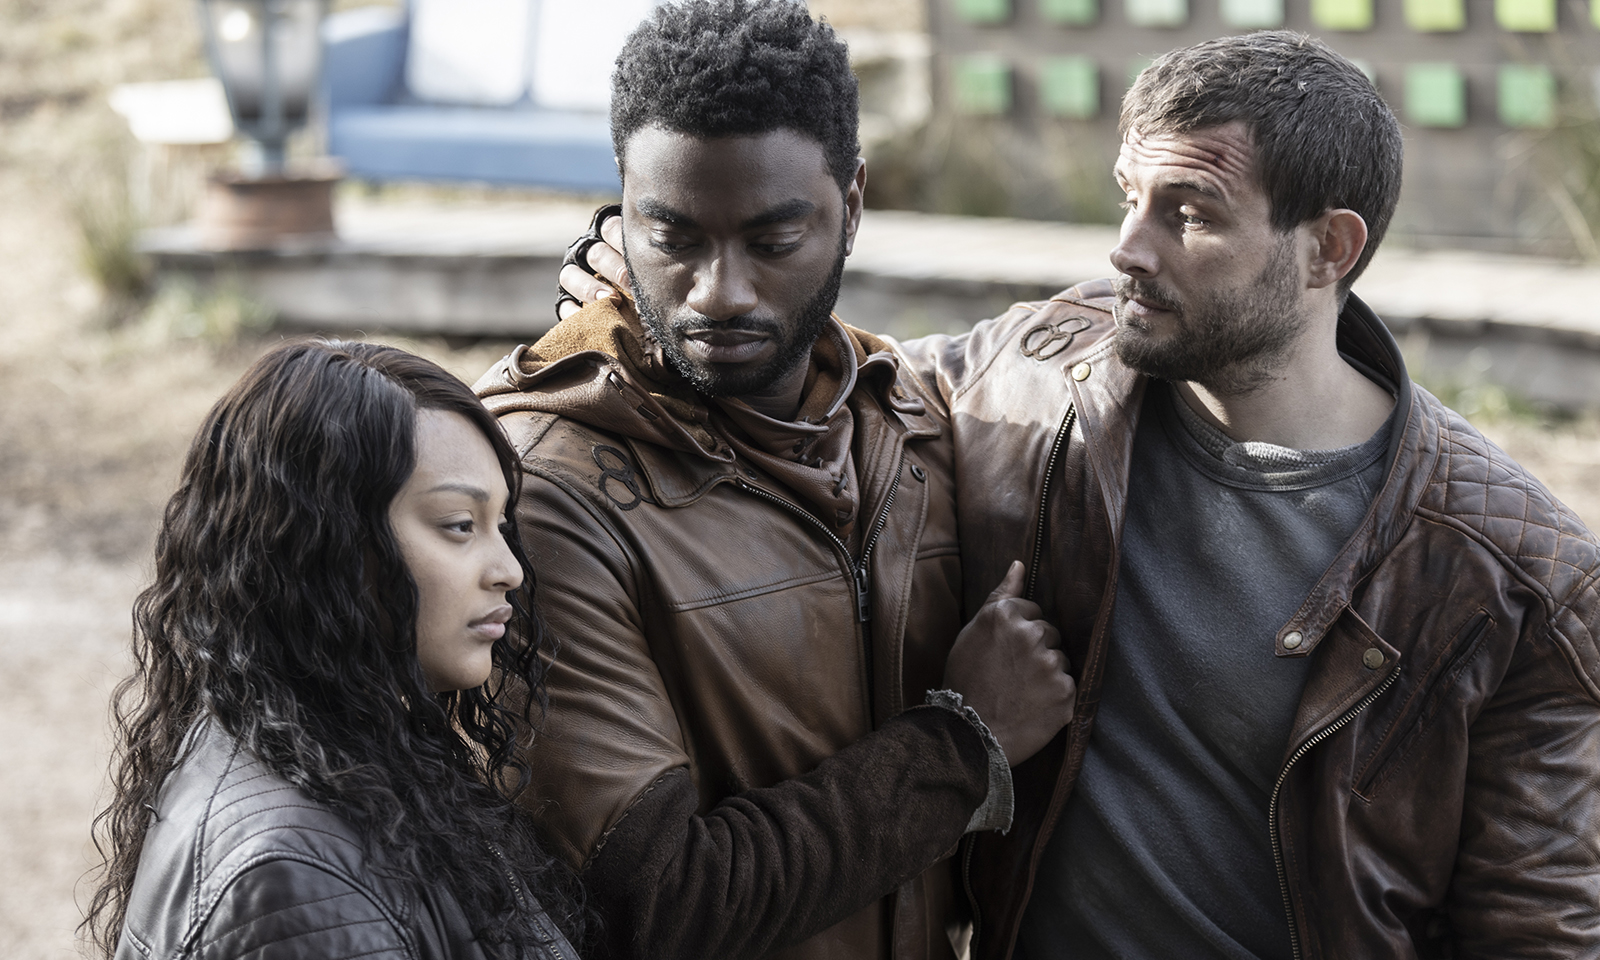 Iris, Will e Felix reunidos no primeiro episódio da 2ª temporada de TWD World Beyond.